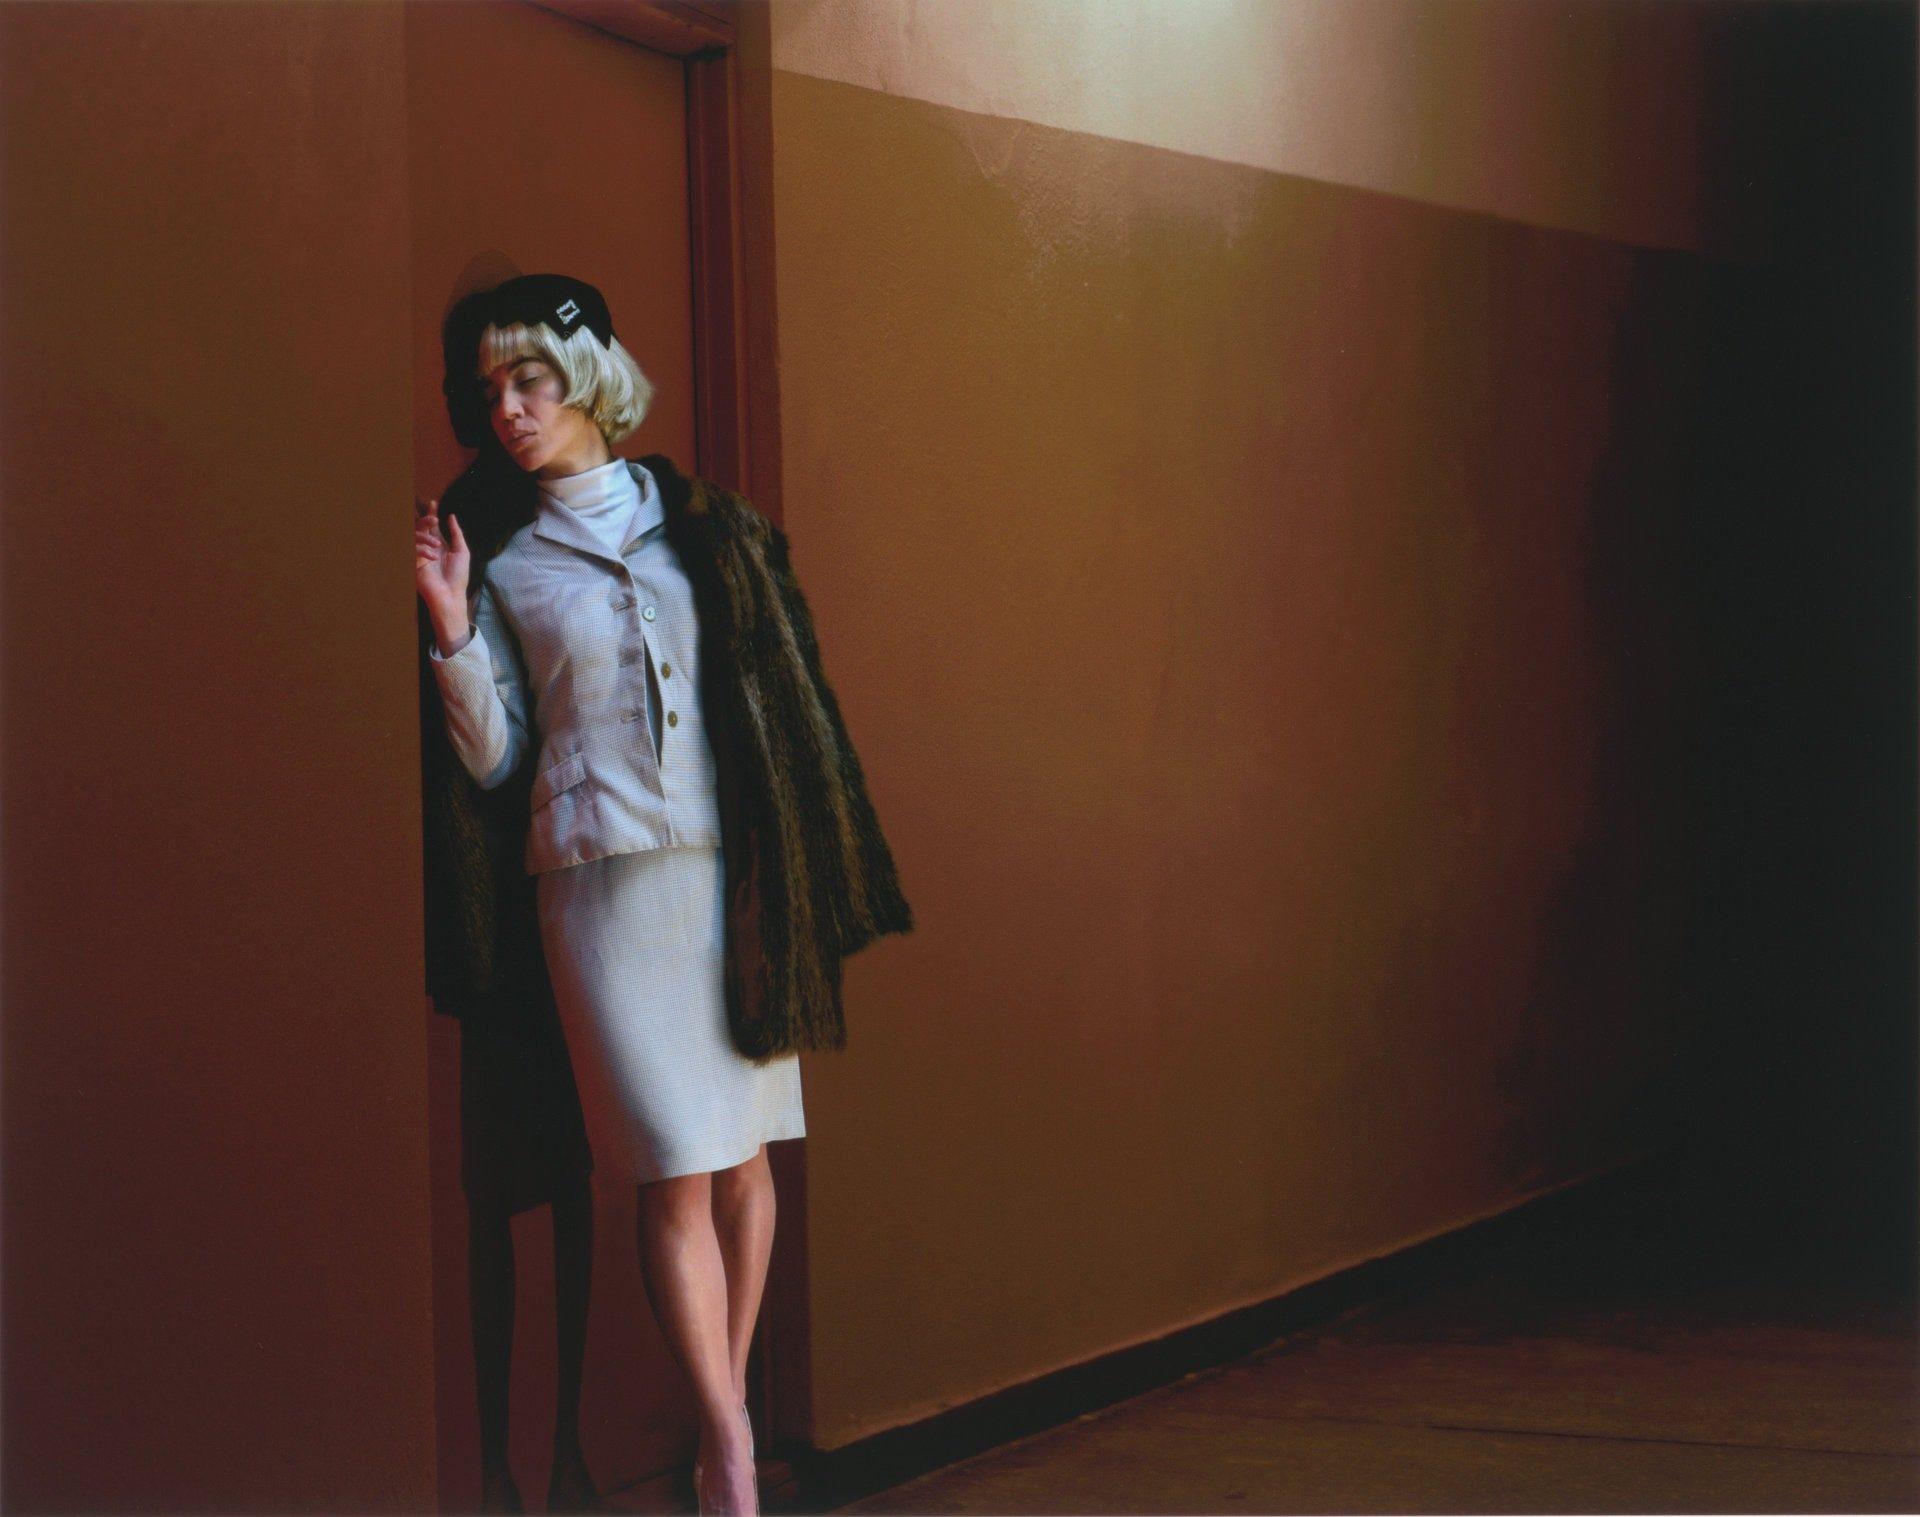 Aneta Grzeszykowska, Untitled Film Stills #23, 2006